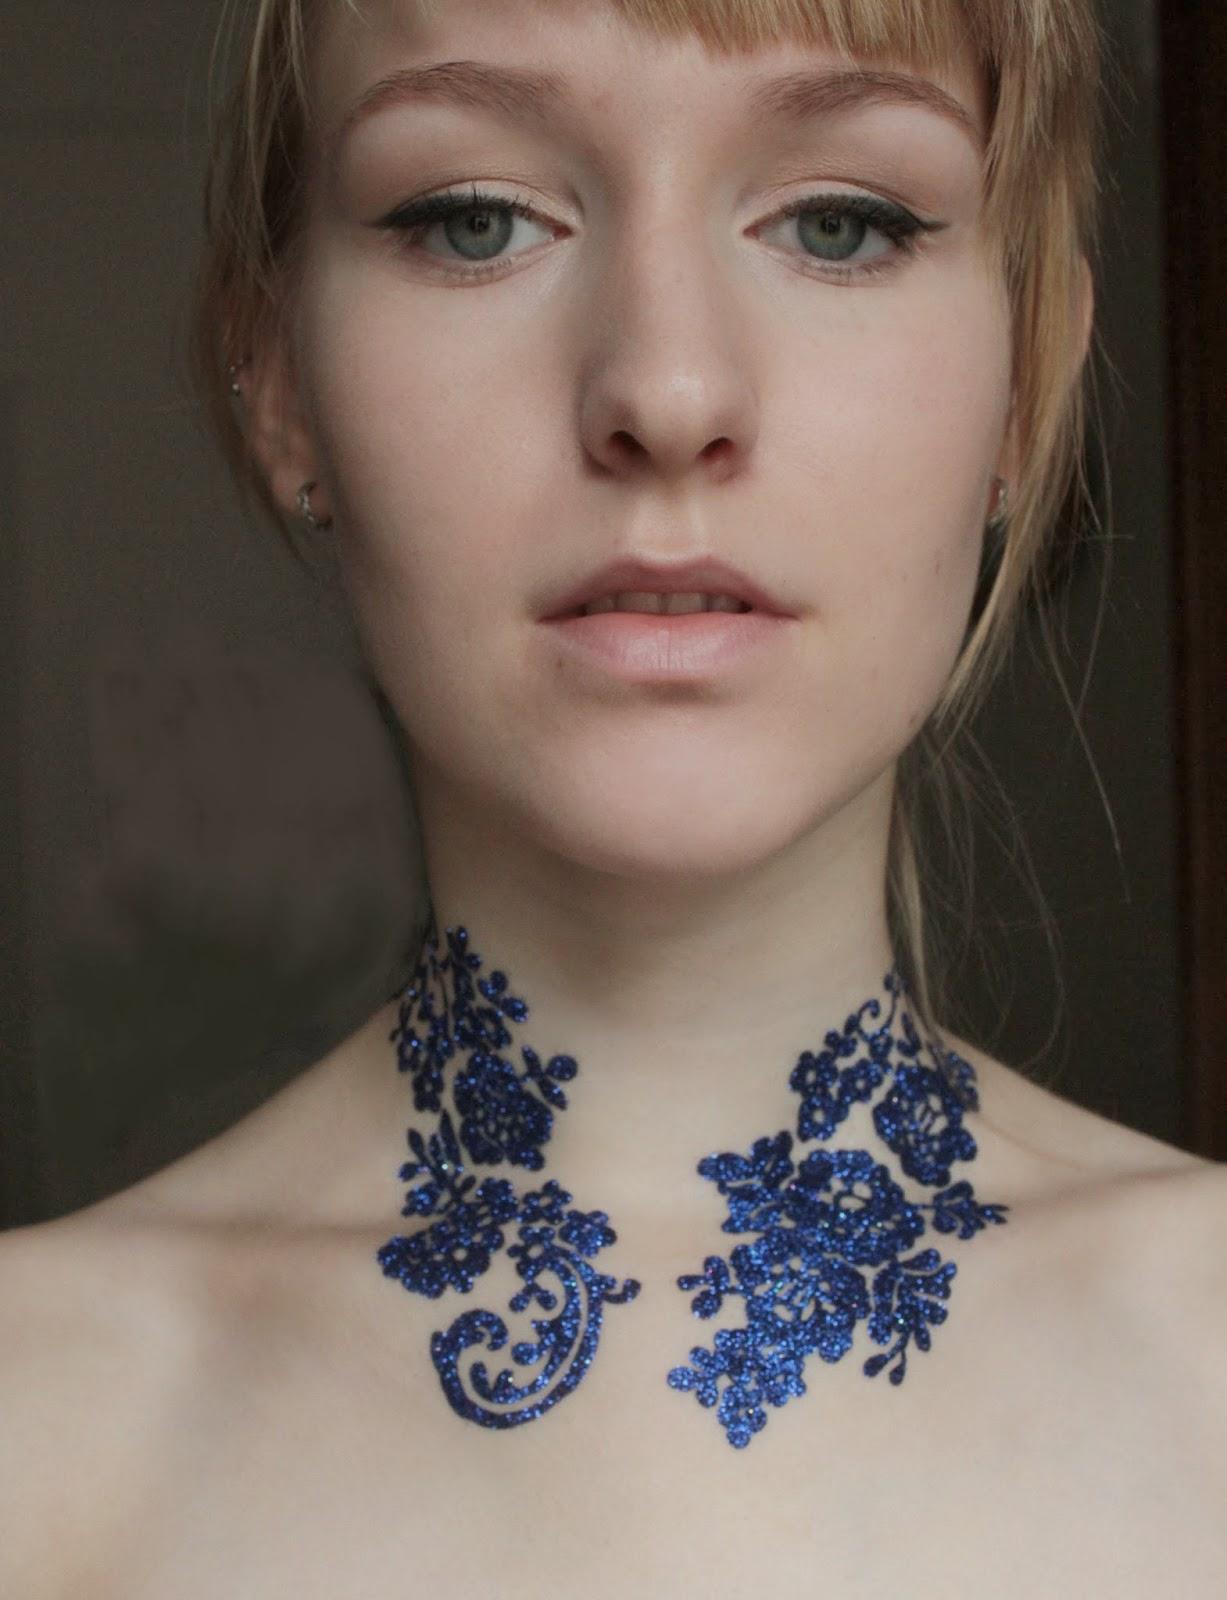 tatouage sourcils marseille - Maquillage permanent Marseille Tattoo & Piercing